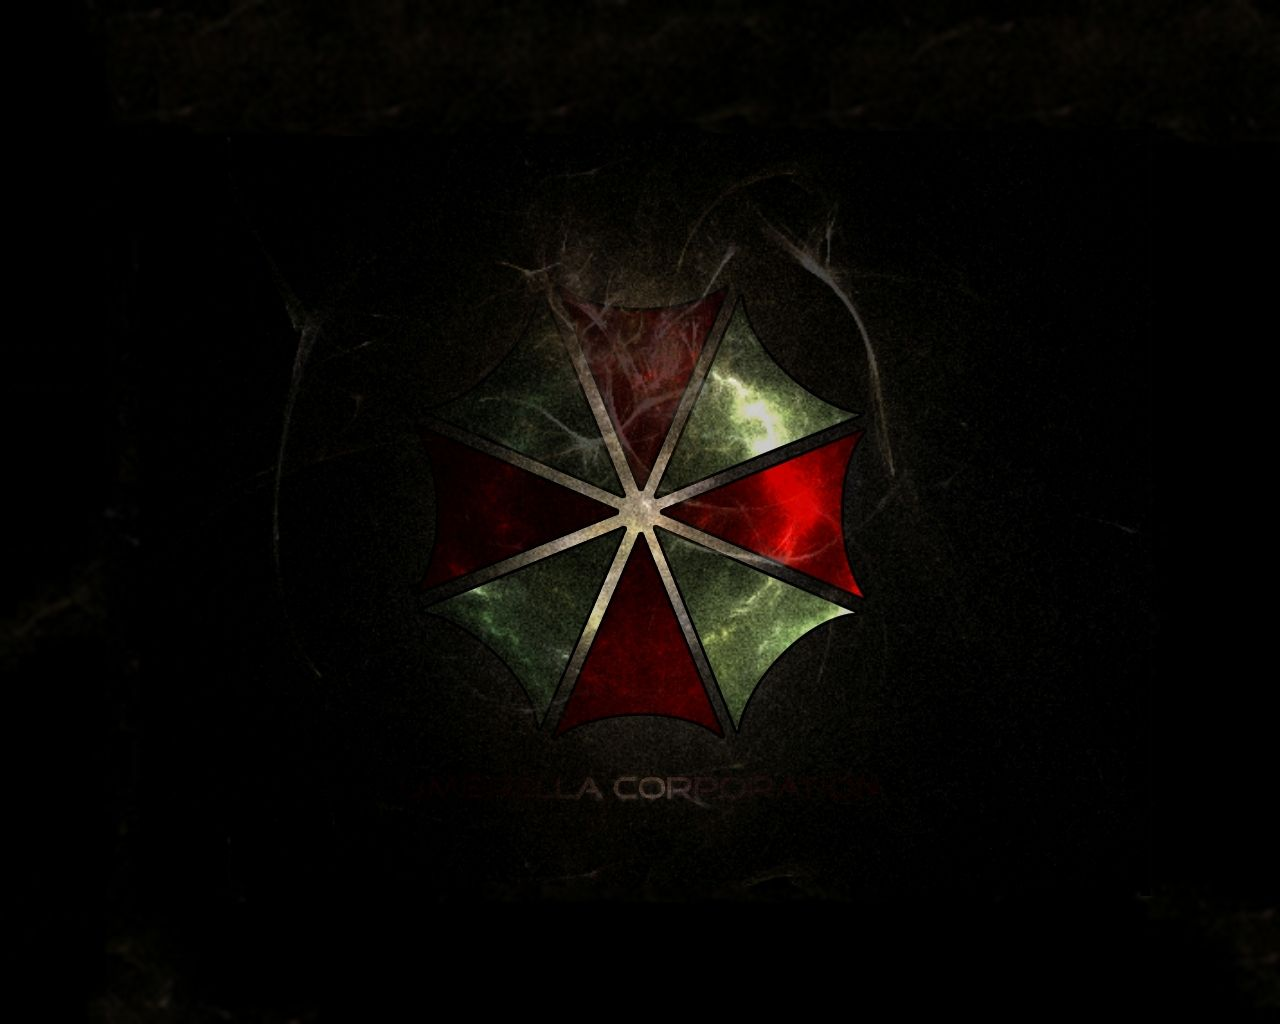 Resident Evil Umbrella Wallpapers Top Free Resident Evil